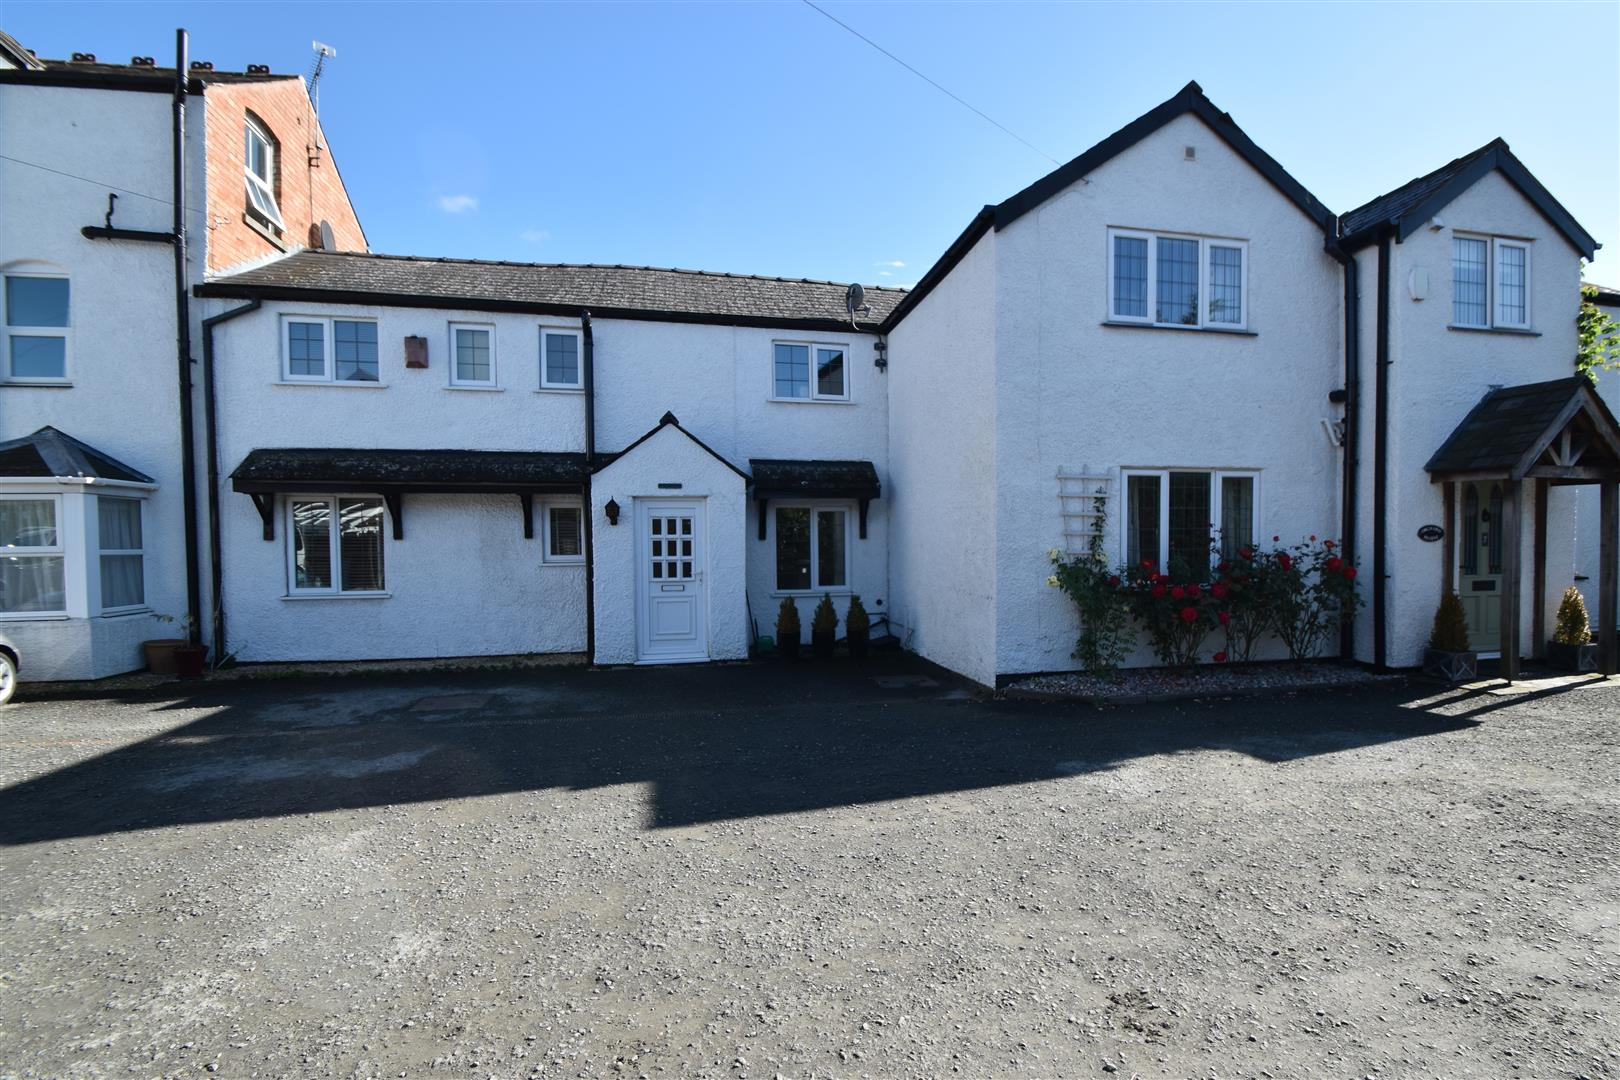 2 Bedrooms Cottage House for sale in Berkley Gardens, Fernhill Heath, Worcester